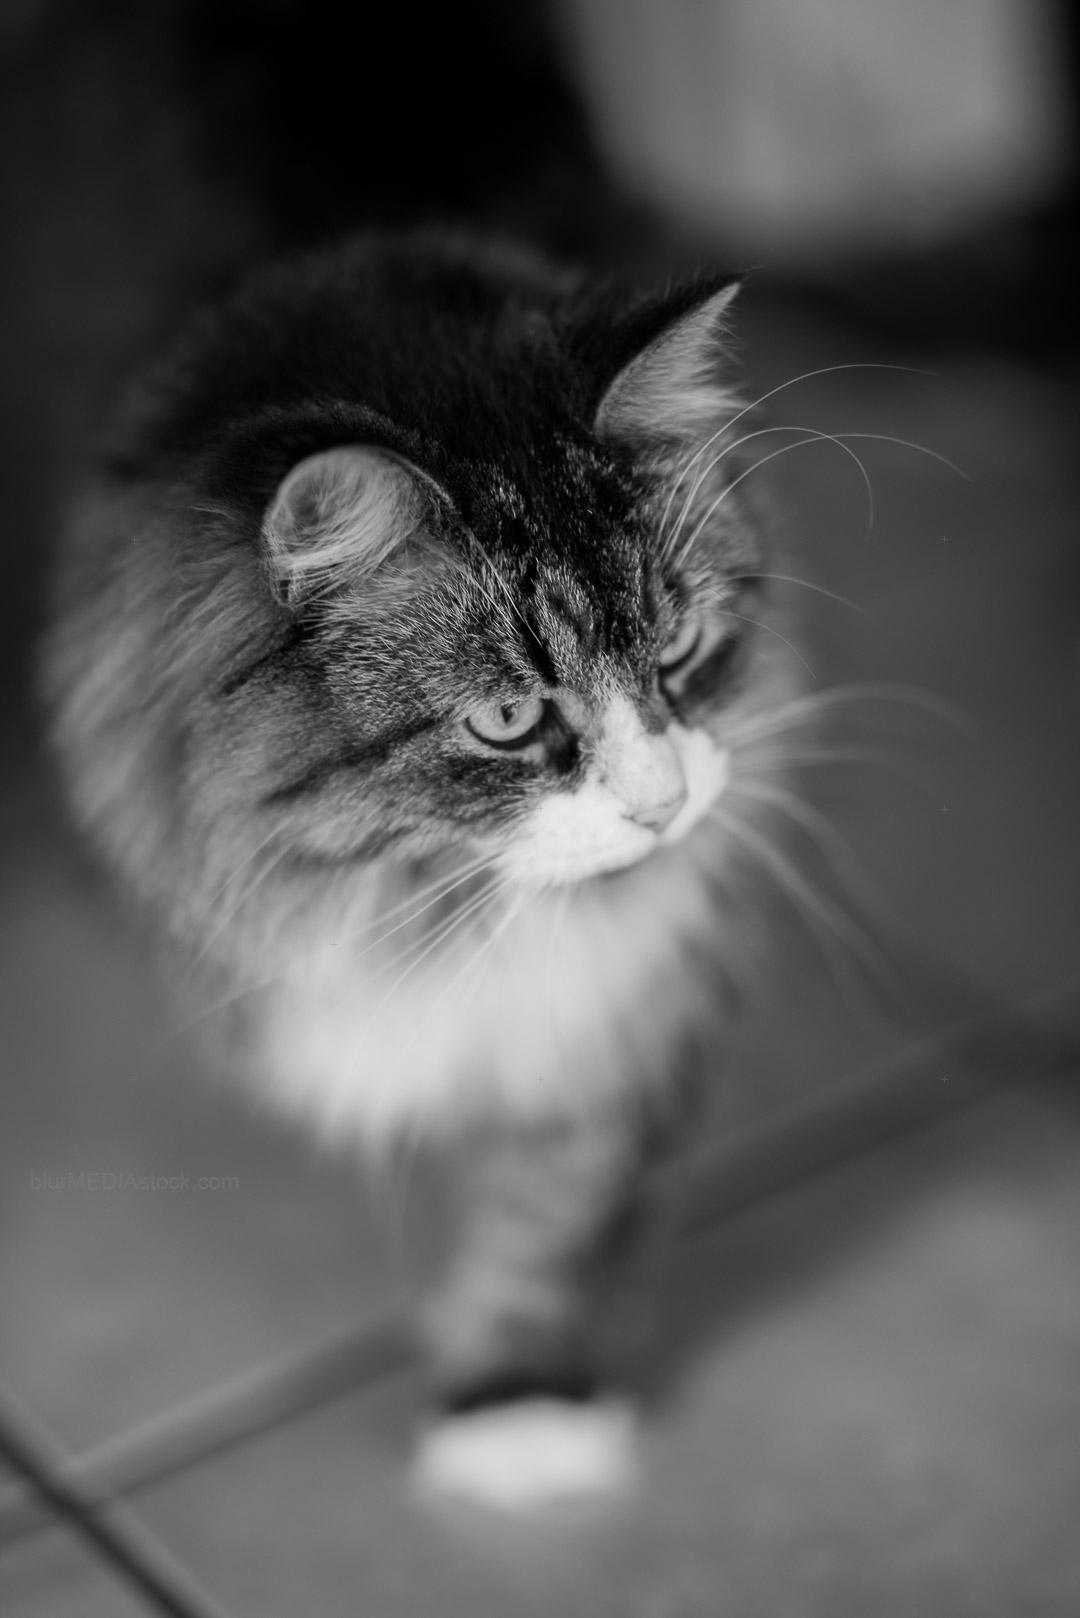 Cat walking across a tile floor